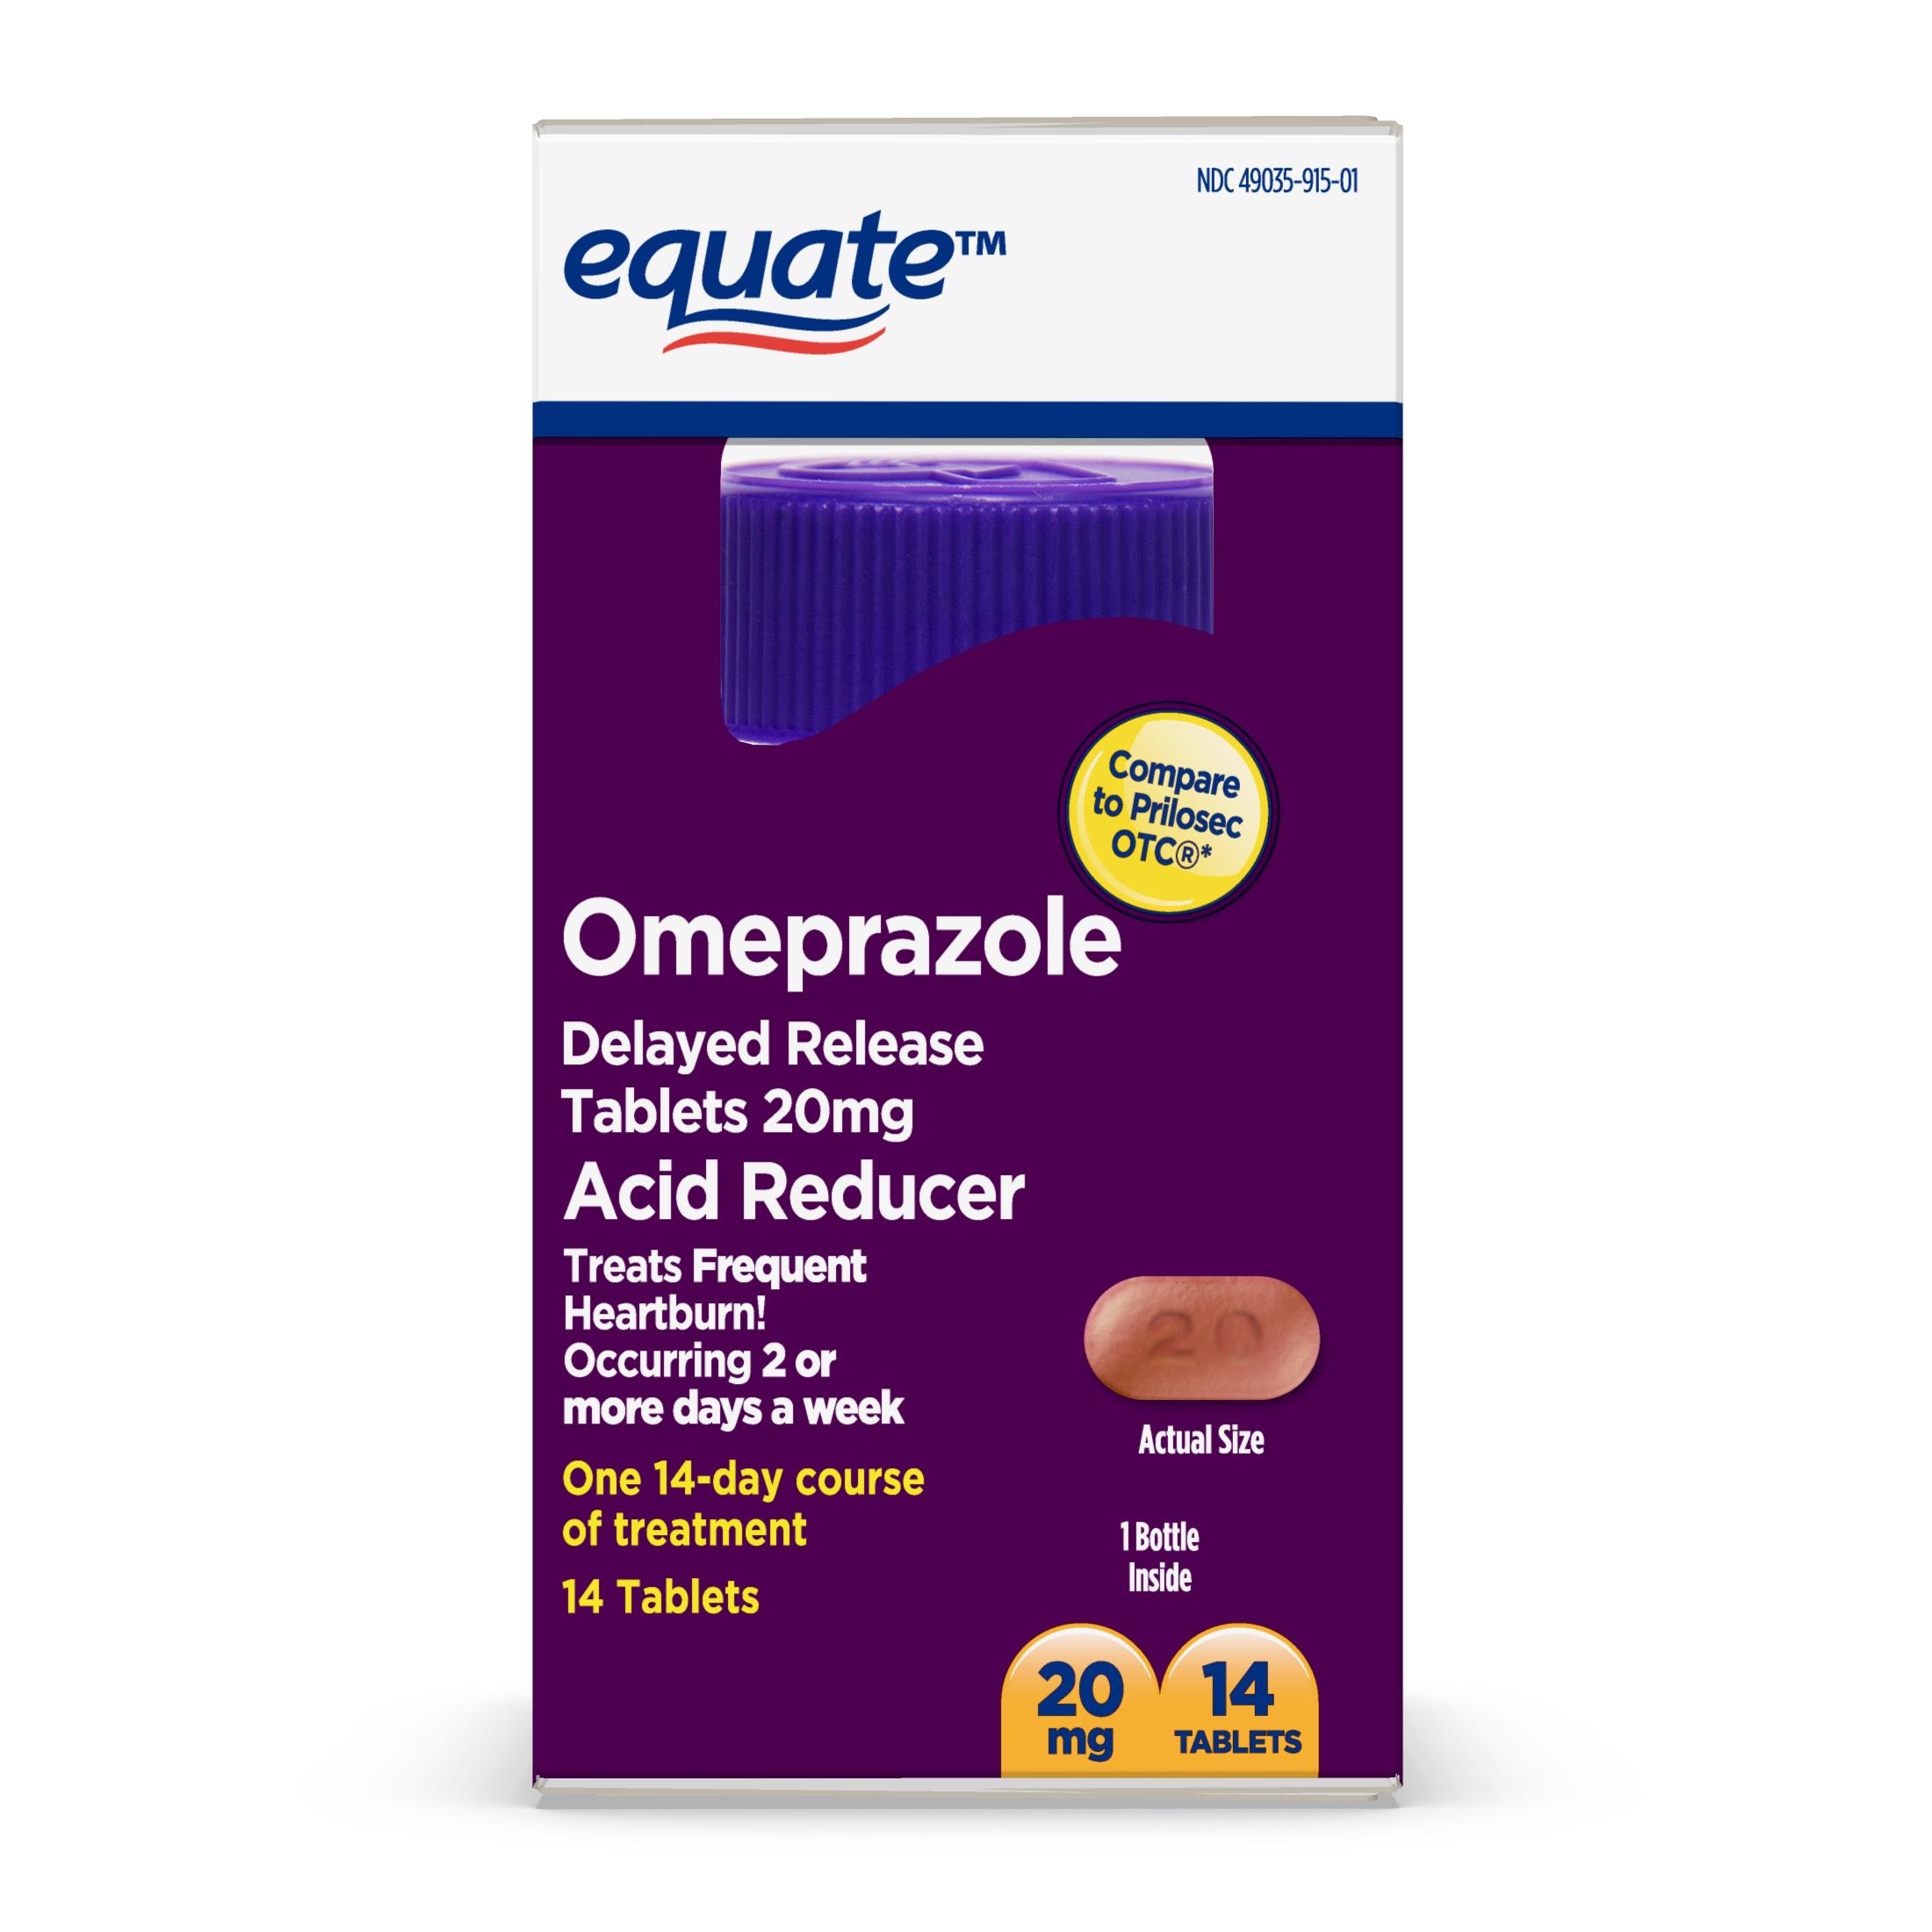 Equate Acid Reducer Omeprazole Delayed Release Tablets 20 mg, 14 Ct